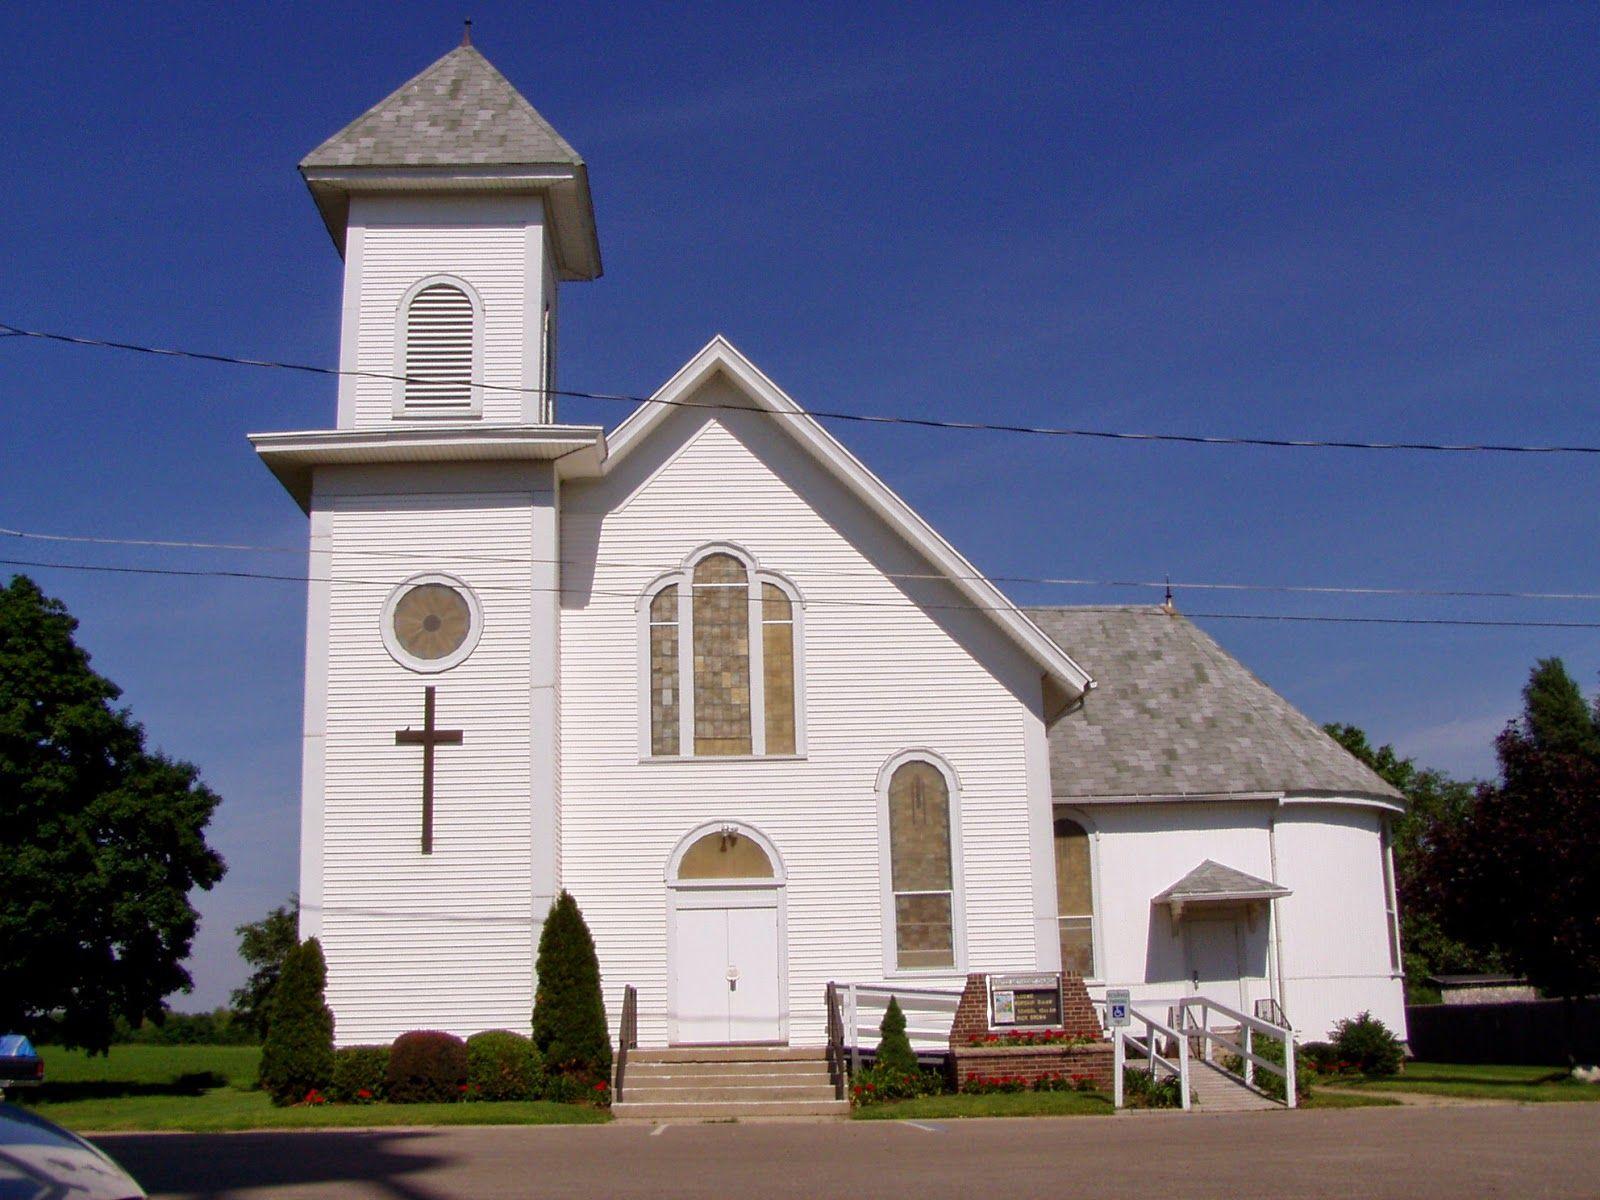 St. Mary's Syriac Orthodox Malayali Church – Mississauga